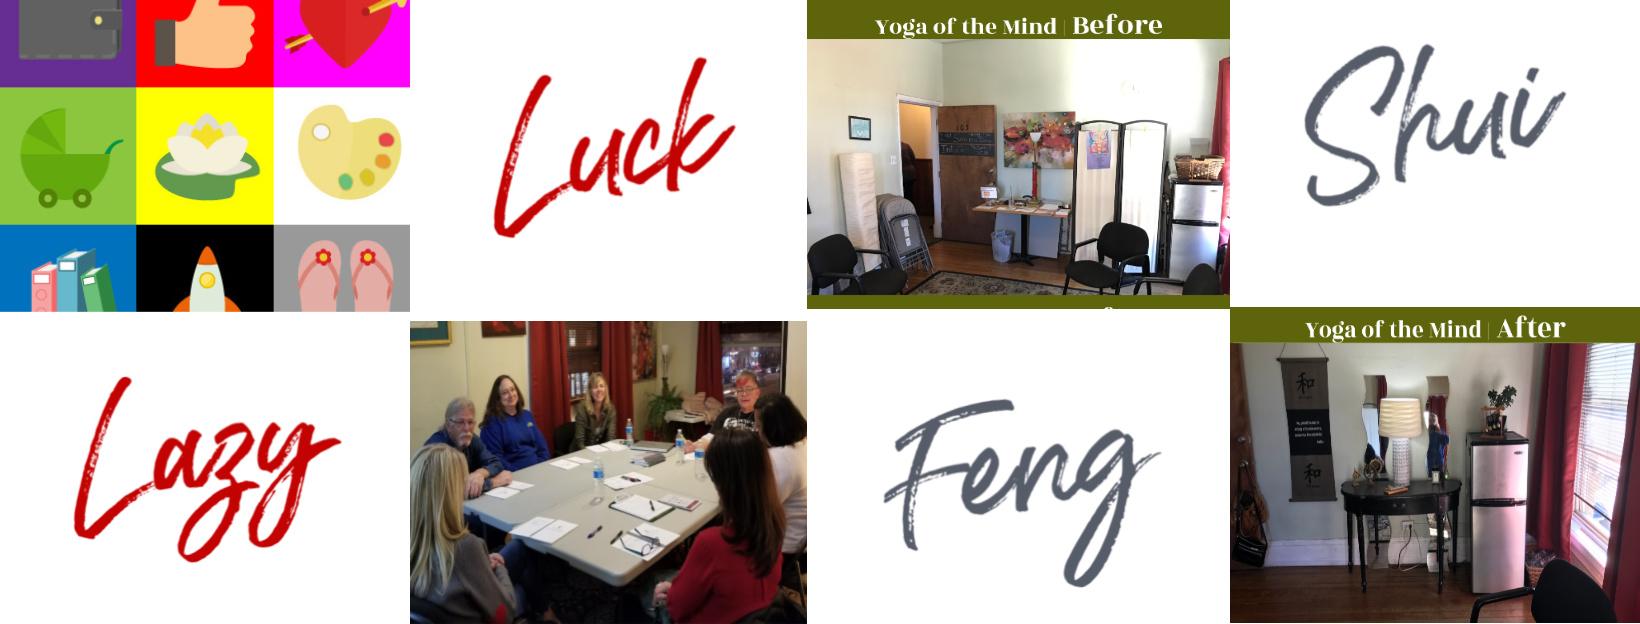 Expert Feng Shui Toulouse feng shui class denver, learn to do feng shui the super easy way